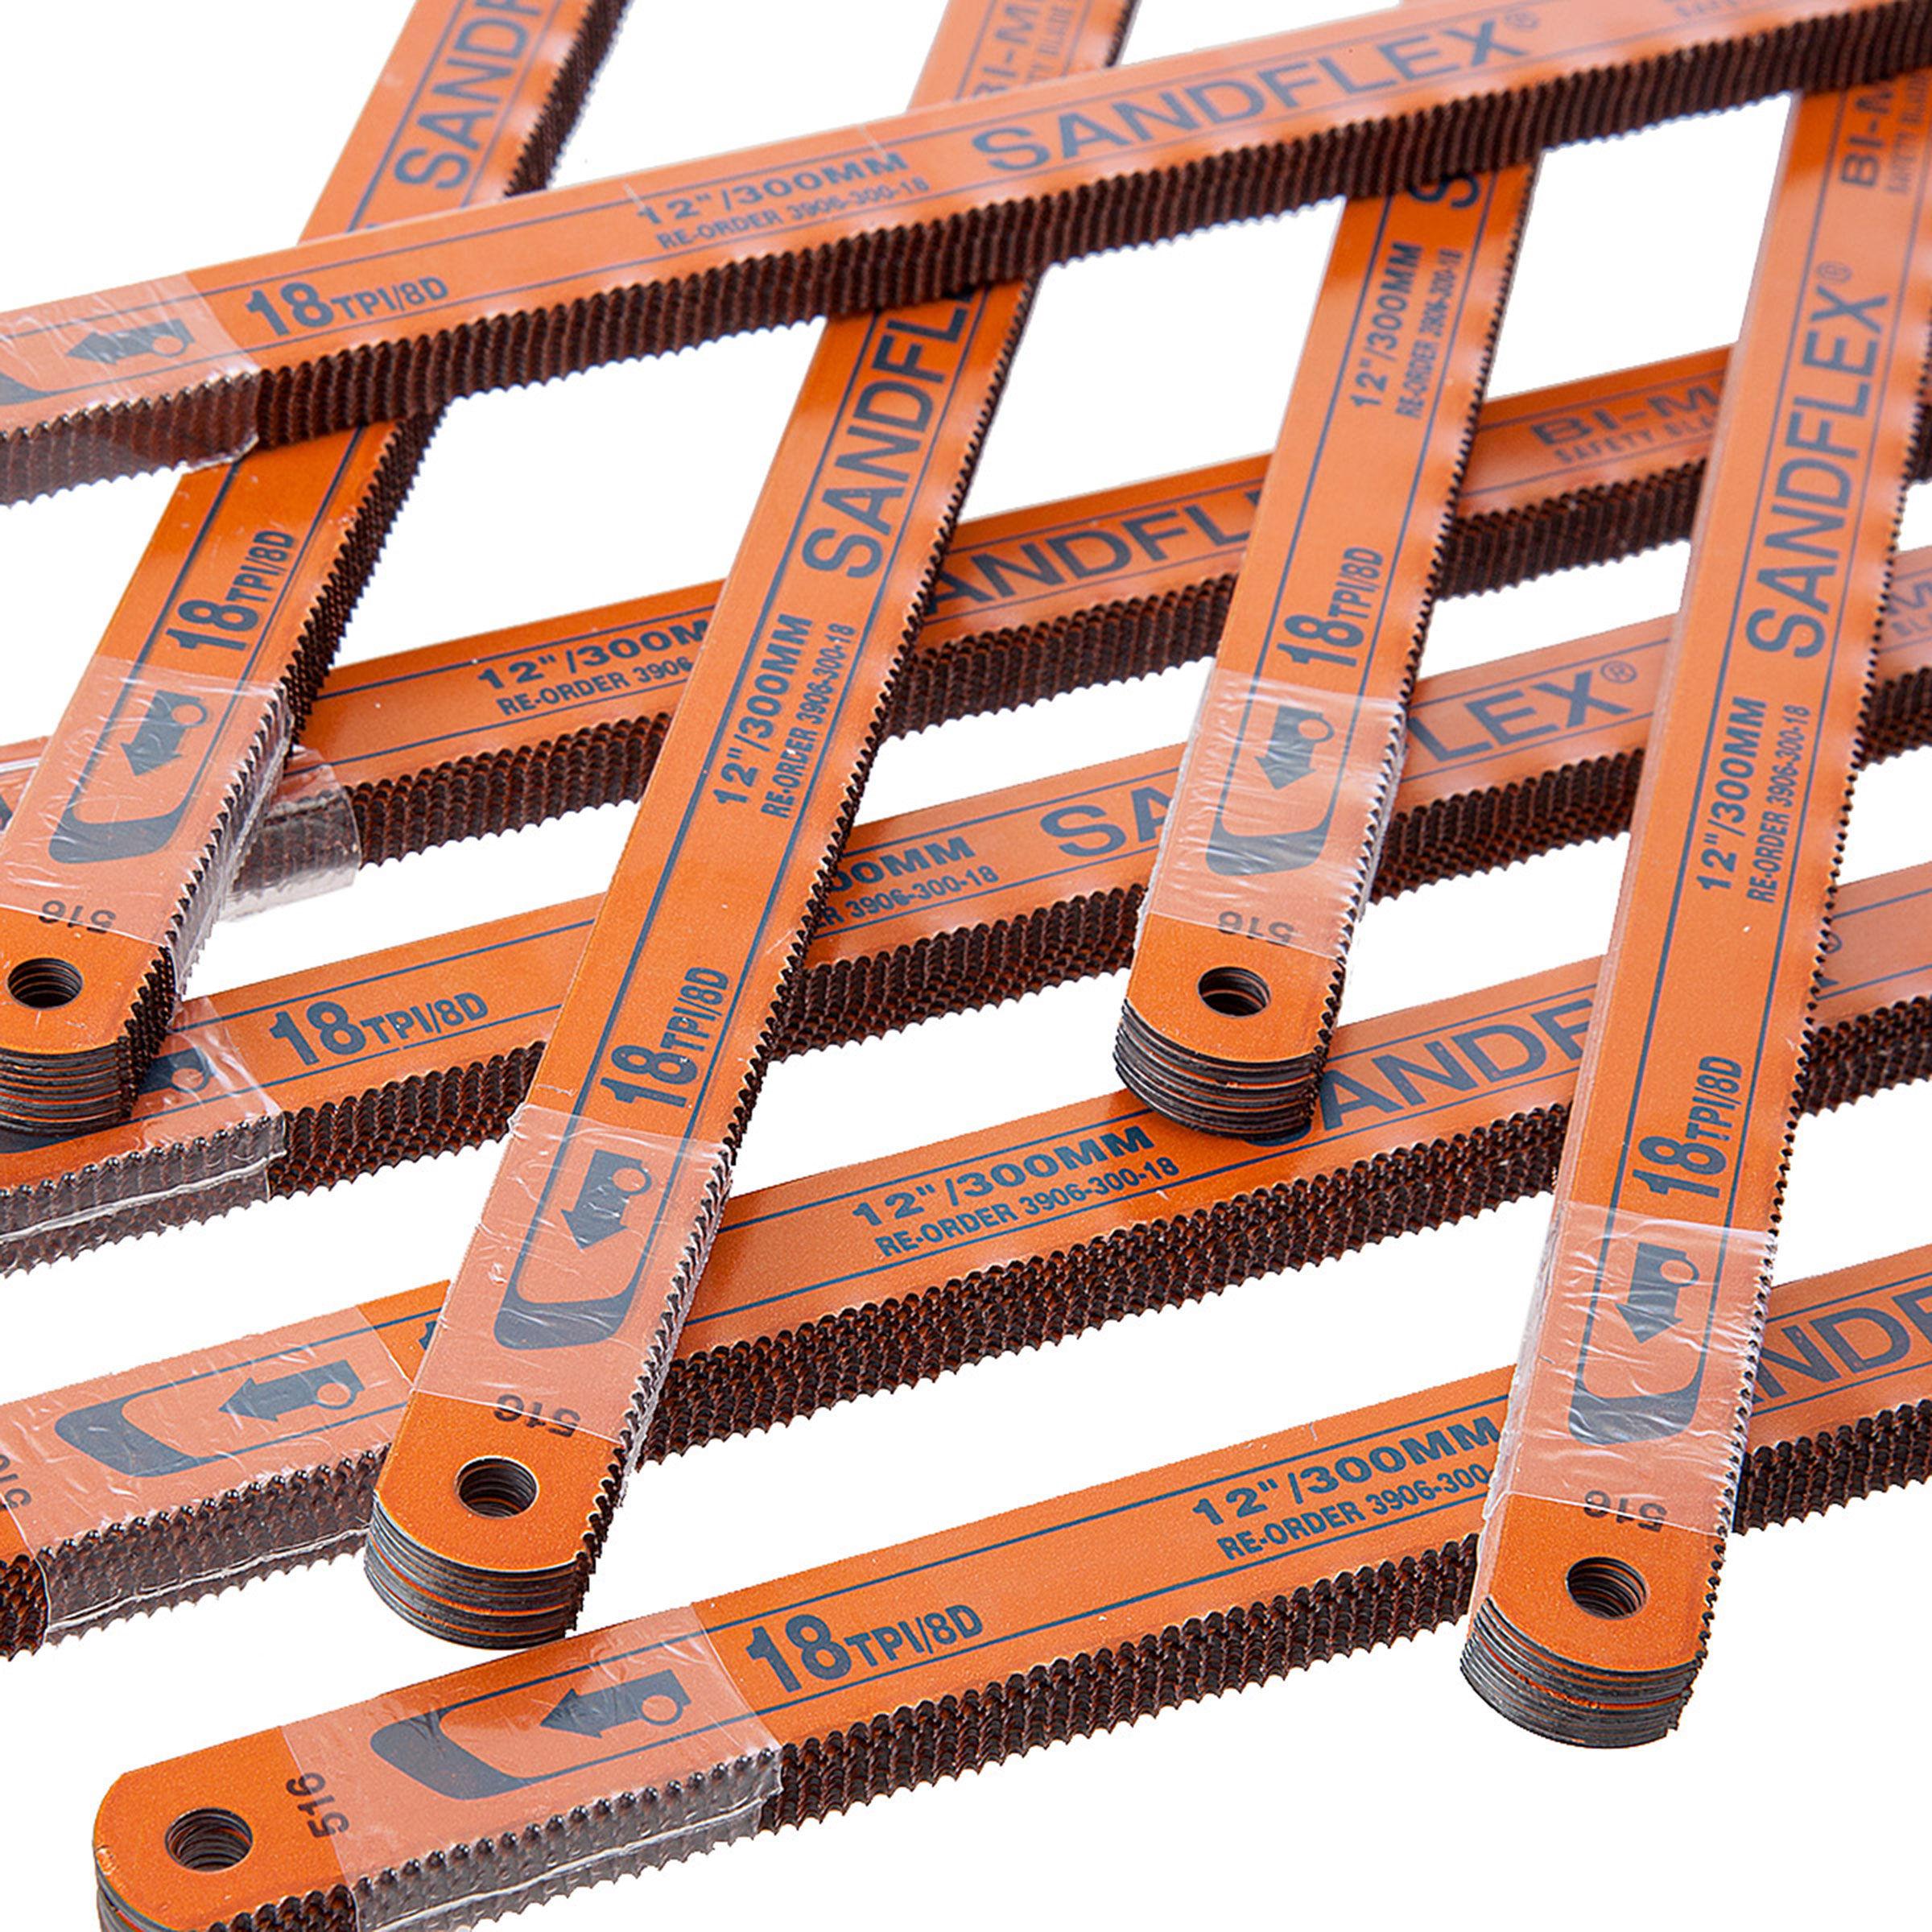 Toolstop Bahco 3906 Bi-Metal Hacksaw Blades 12 Inch x ...